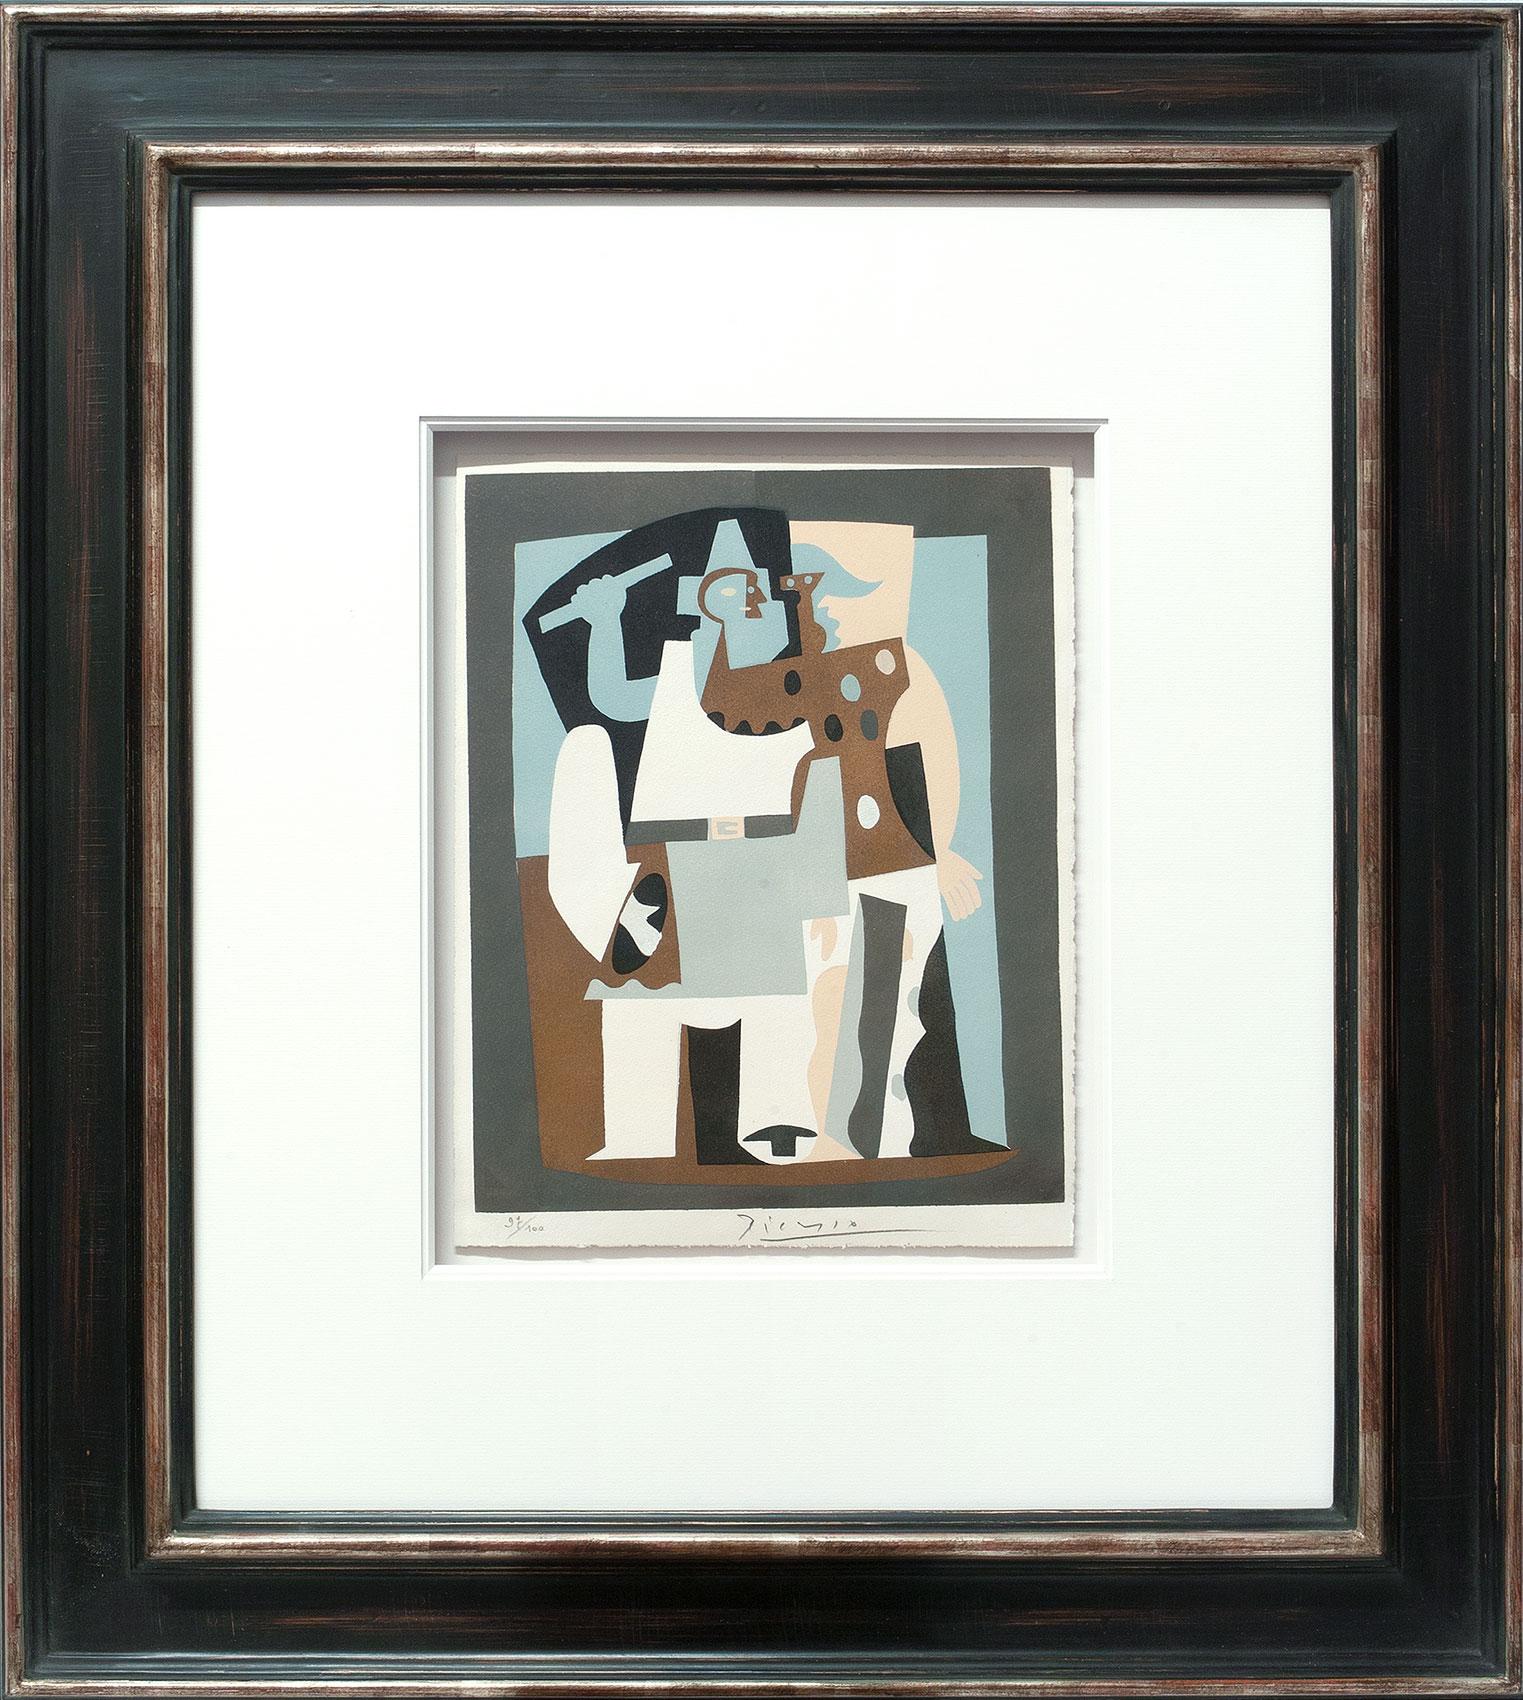 Pablo Picasso «Pierrot et arlequin II» Galerie Française